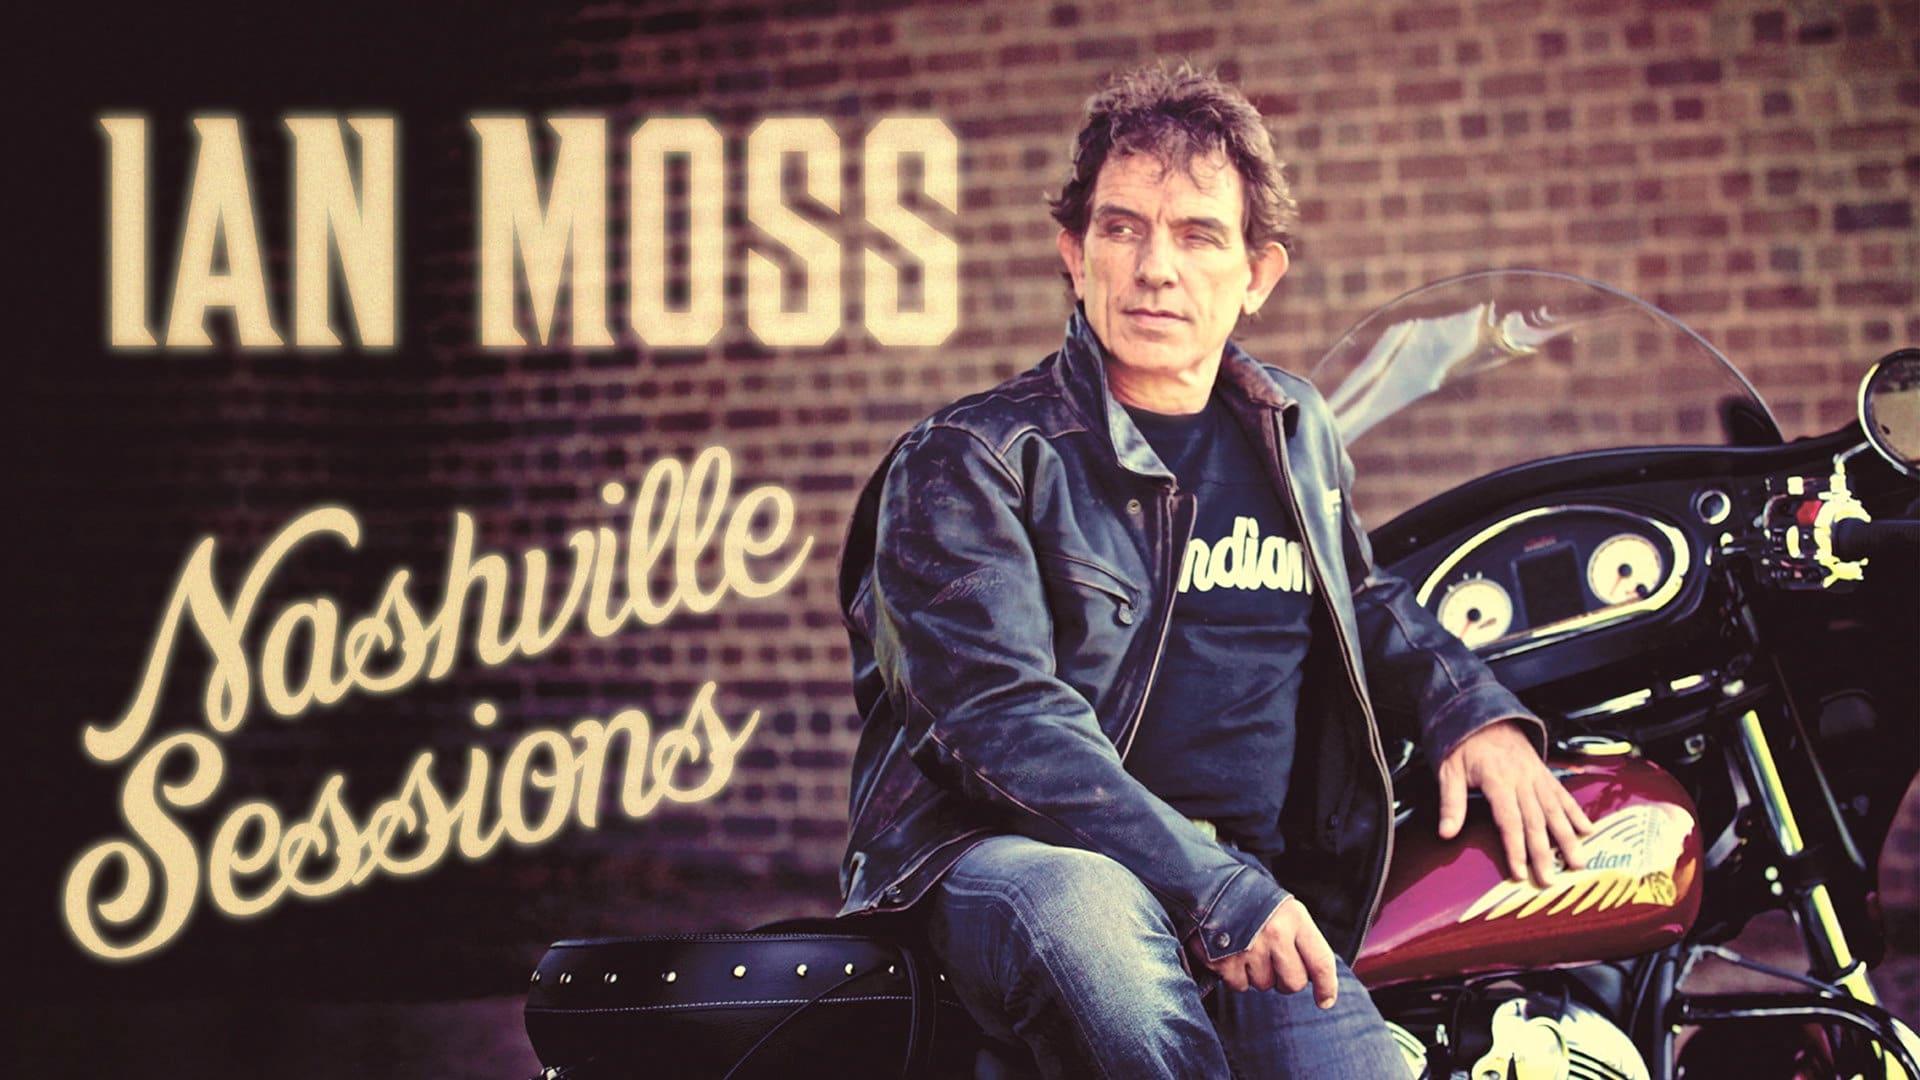 Ian Moss - Nashville Sessions